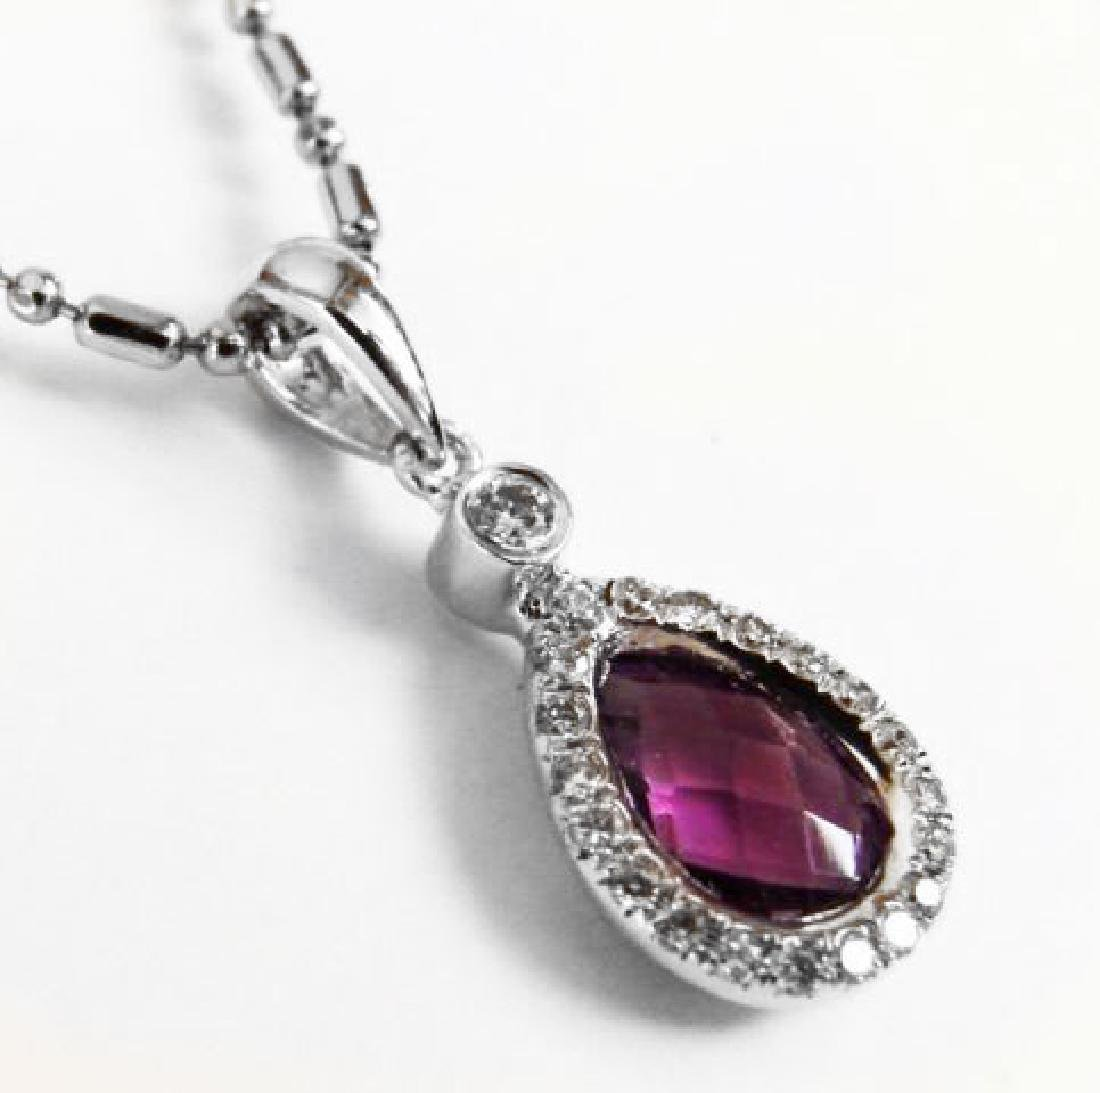 Diamond Amethyst Pendant: 1.46 Carat 14k W/g